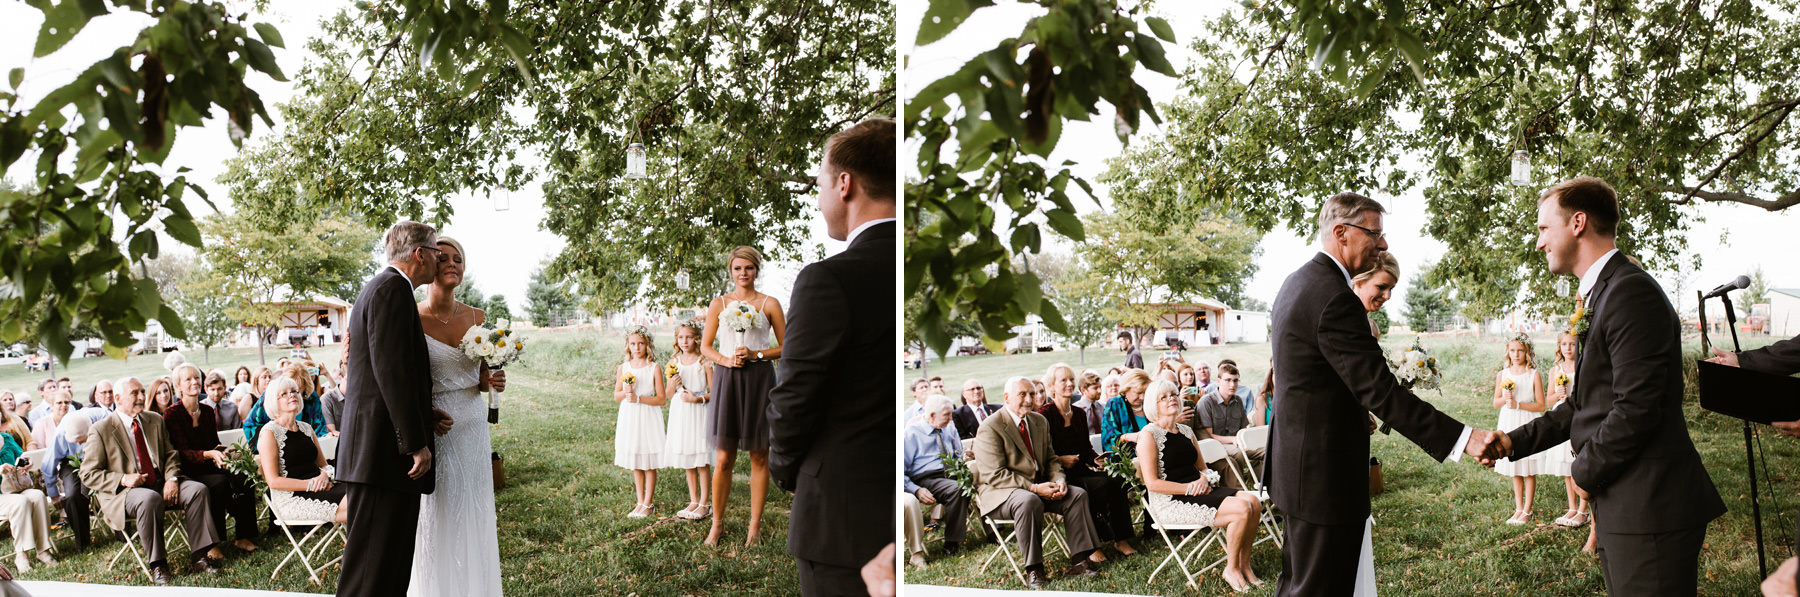 Alldredge Orchard Kansas City_Kindling Wedding Photography BLOG 42.JPG